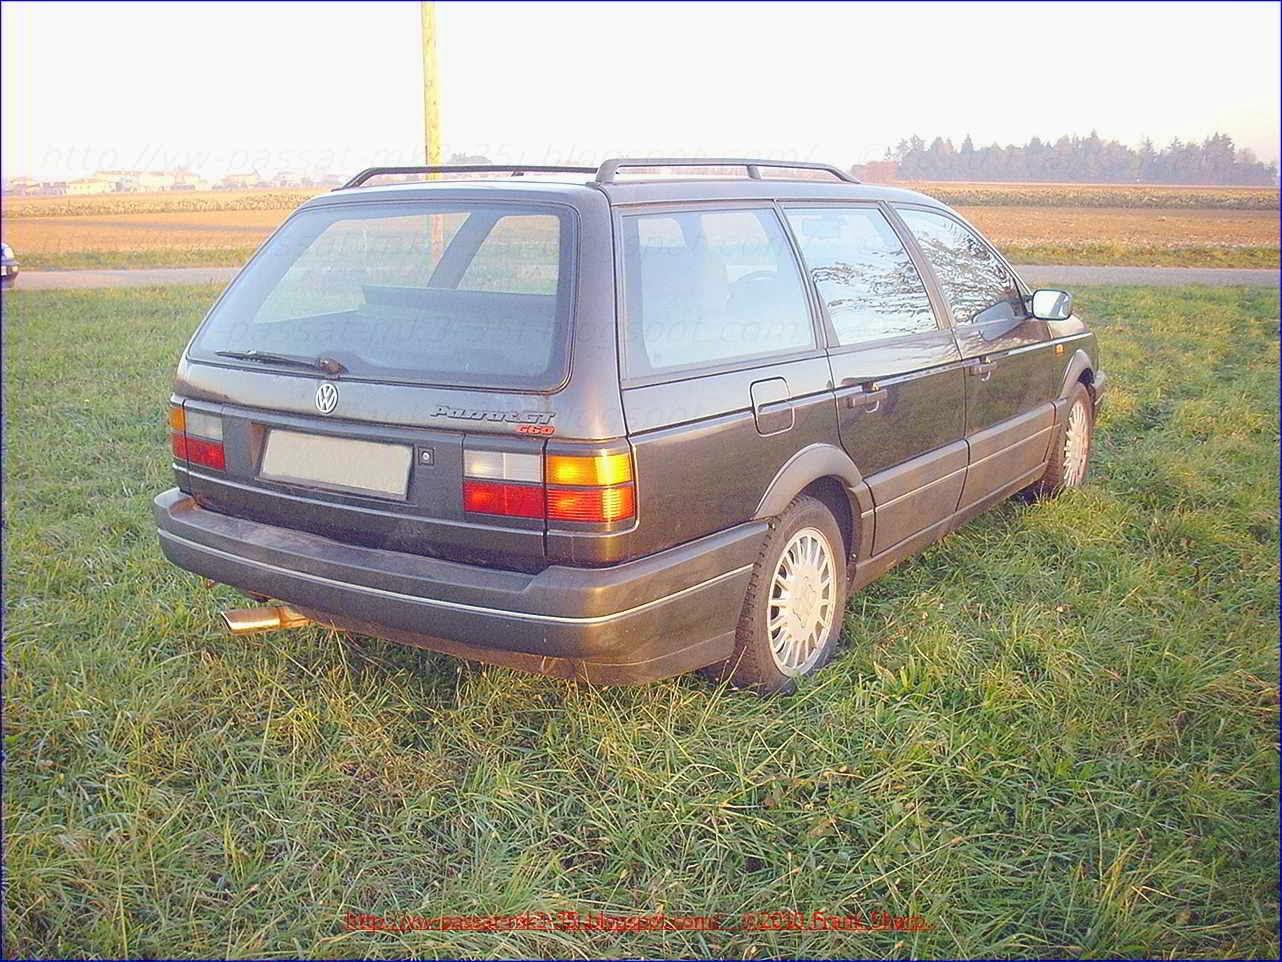 Volkswagen Passat Gt G60 Synchro 35i Mk3 Year 1990 1 8 Fuse Box